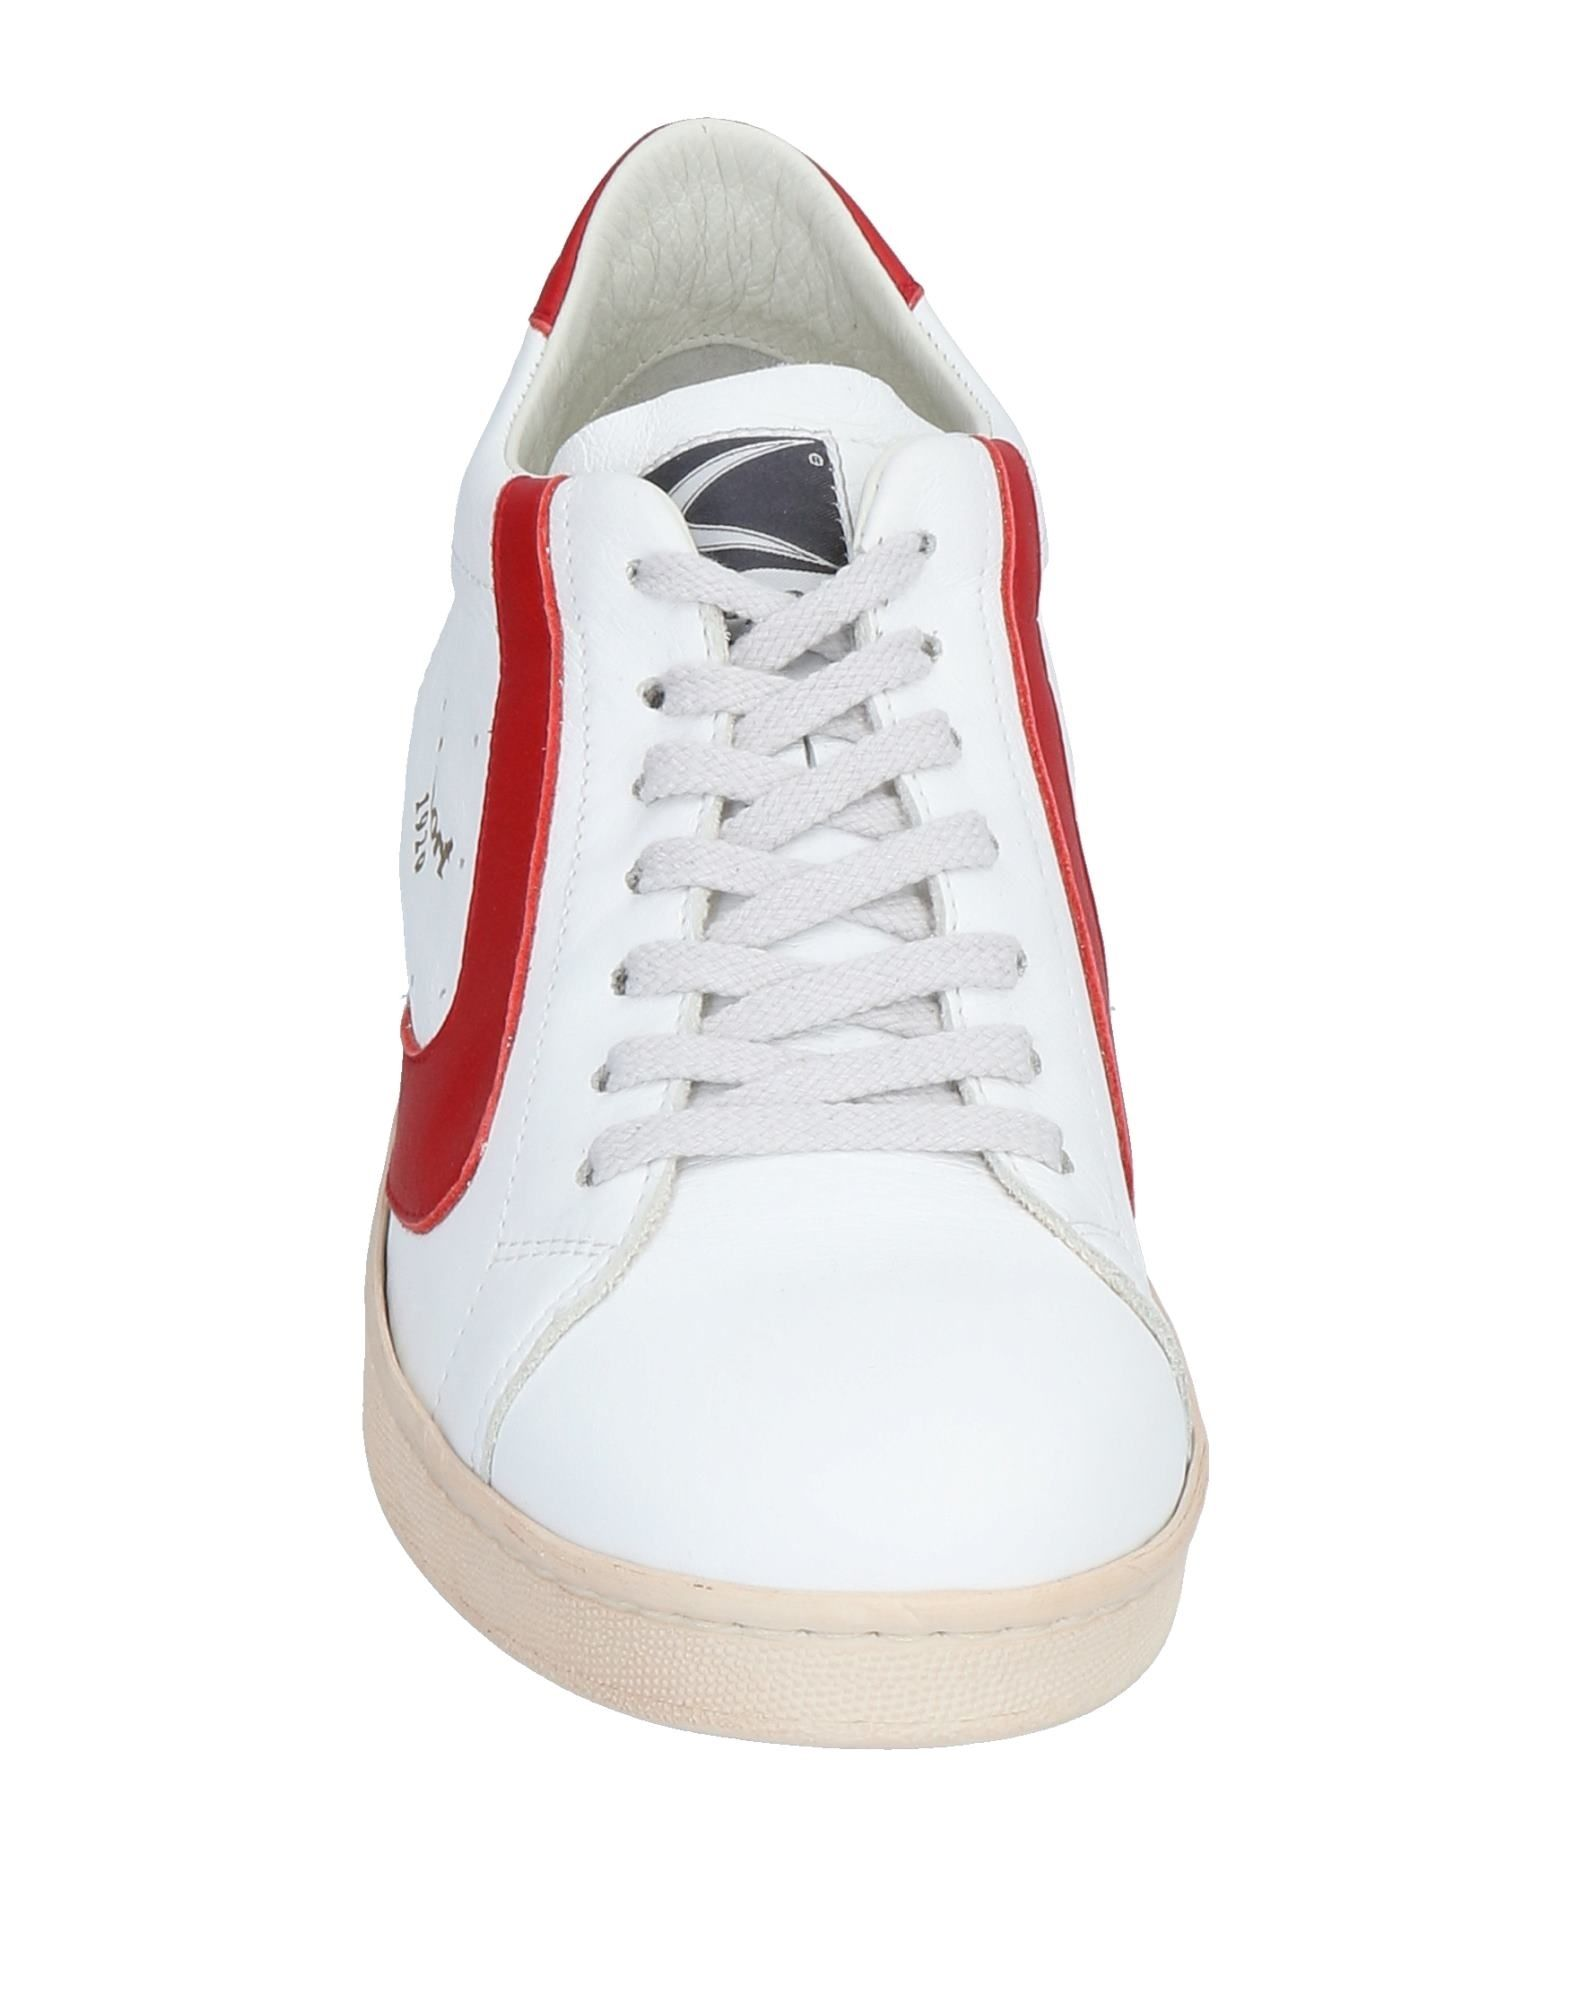 Rabatt echte Schuhe Valsport  Sneakers Herren  Valsport 11475420CQ 8e1aec